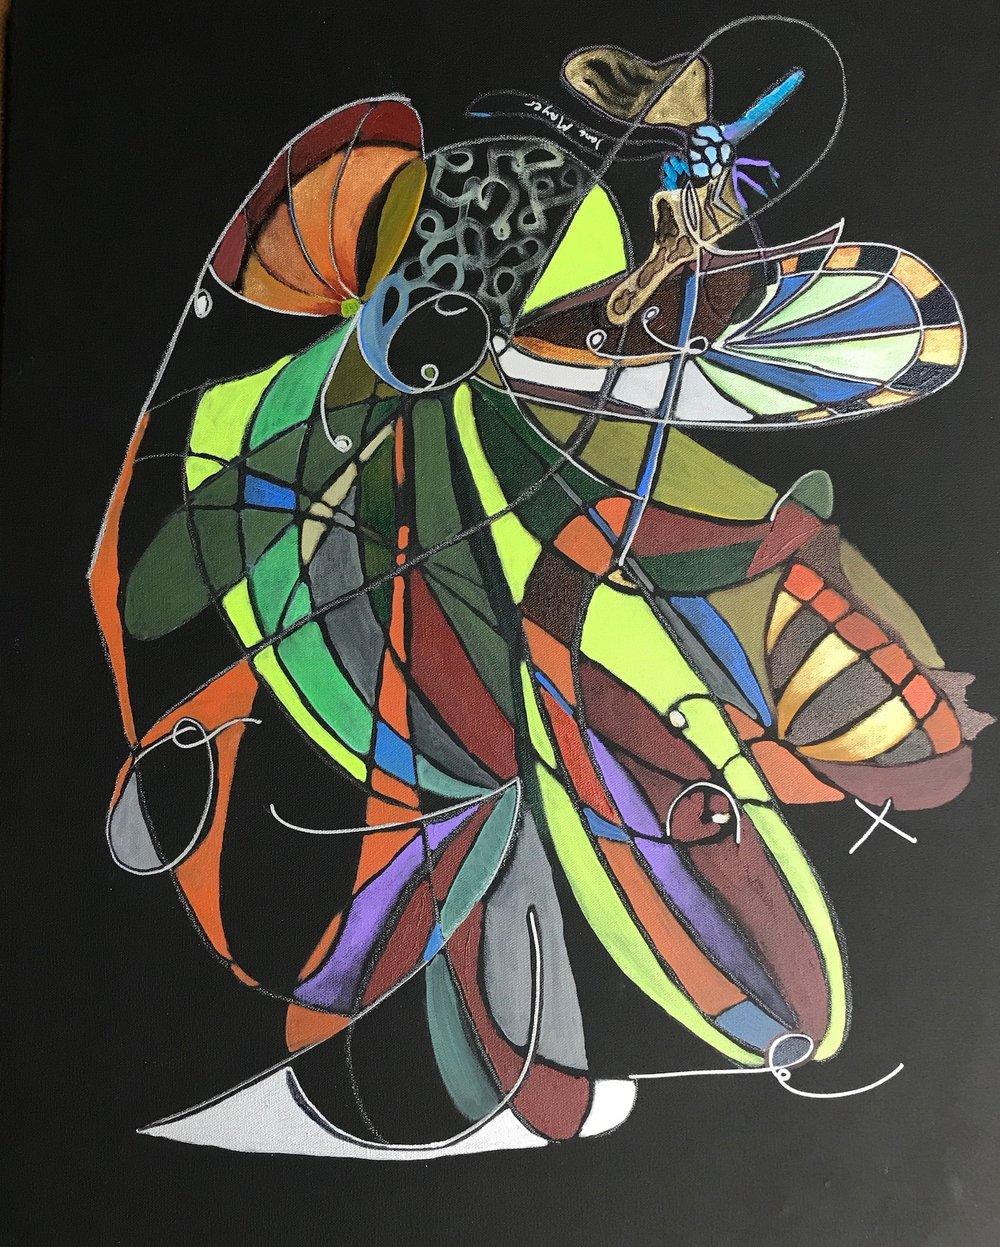 Flutter by Jane Mayer